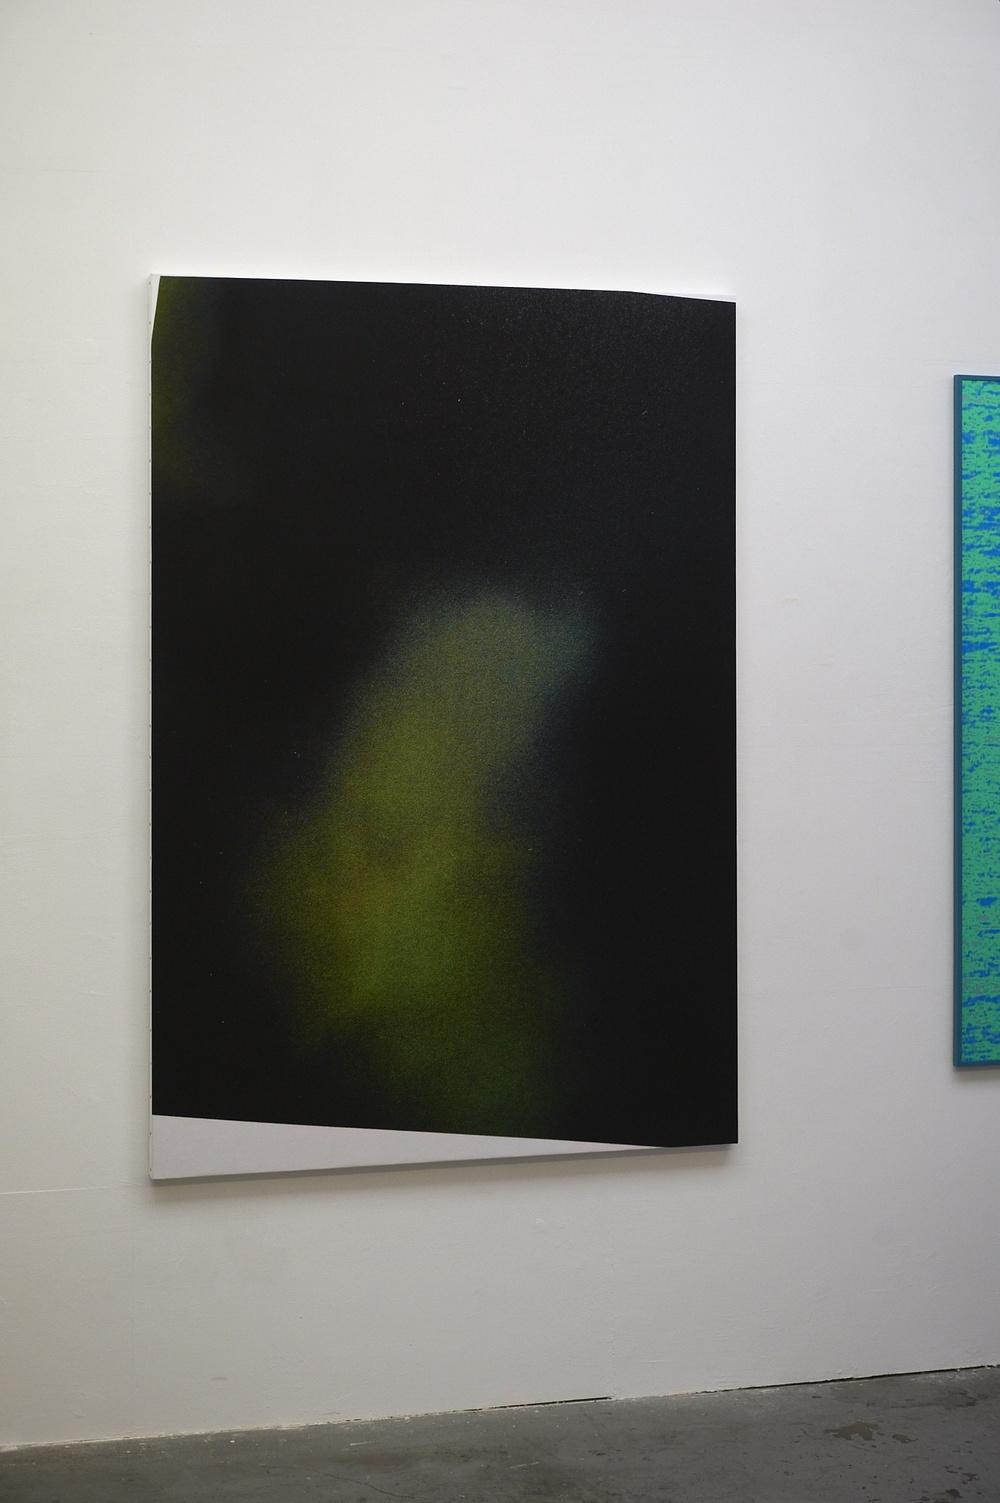 study / copy / print  Exhibition @HAPPA / sakumotto 2014/5/30(fri)~6/14(sat) 12:00-20:00